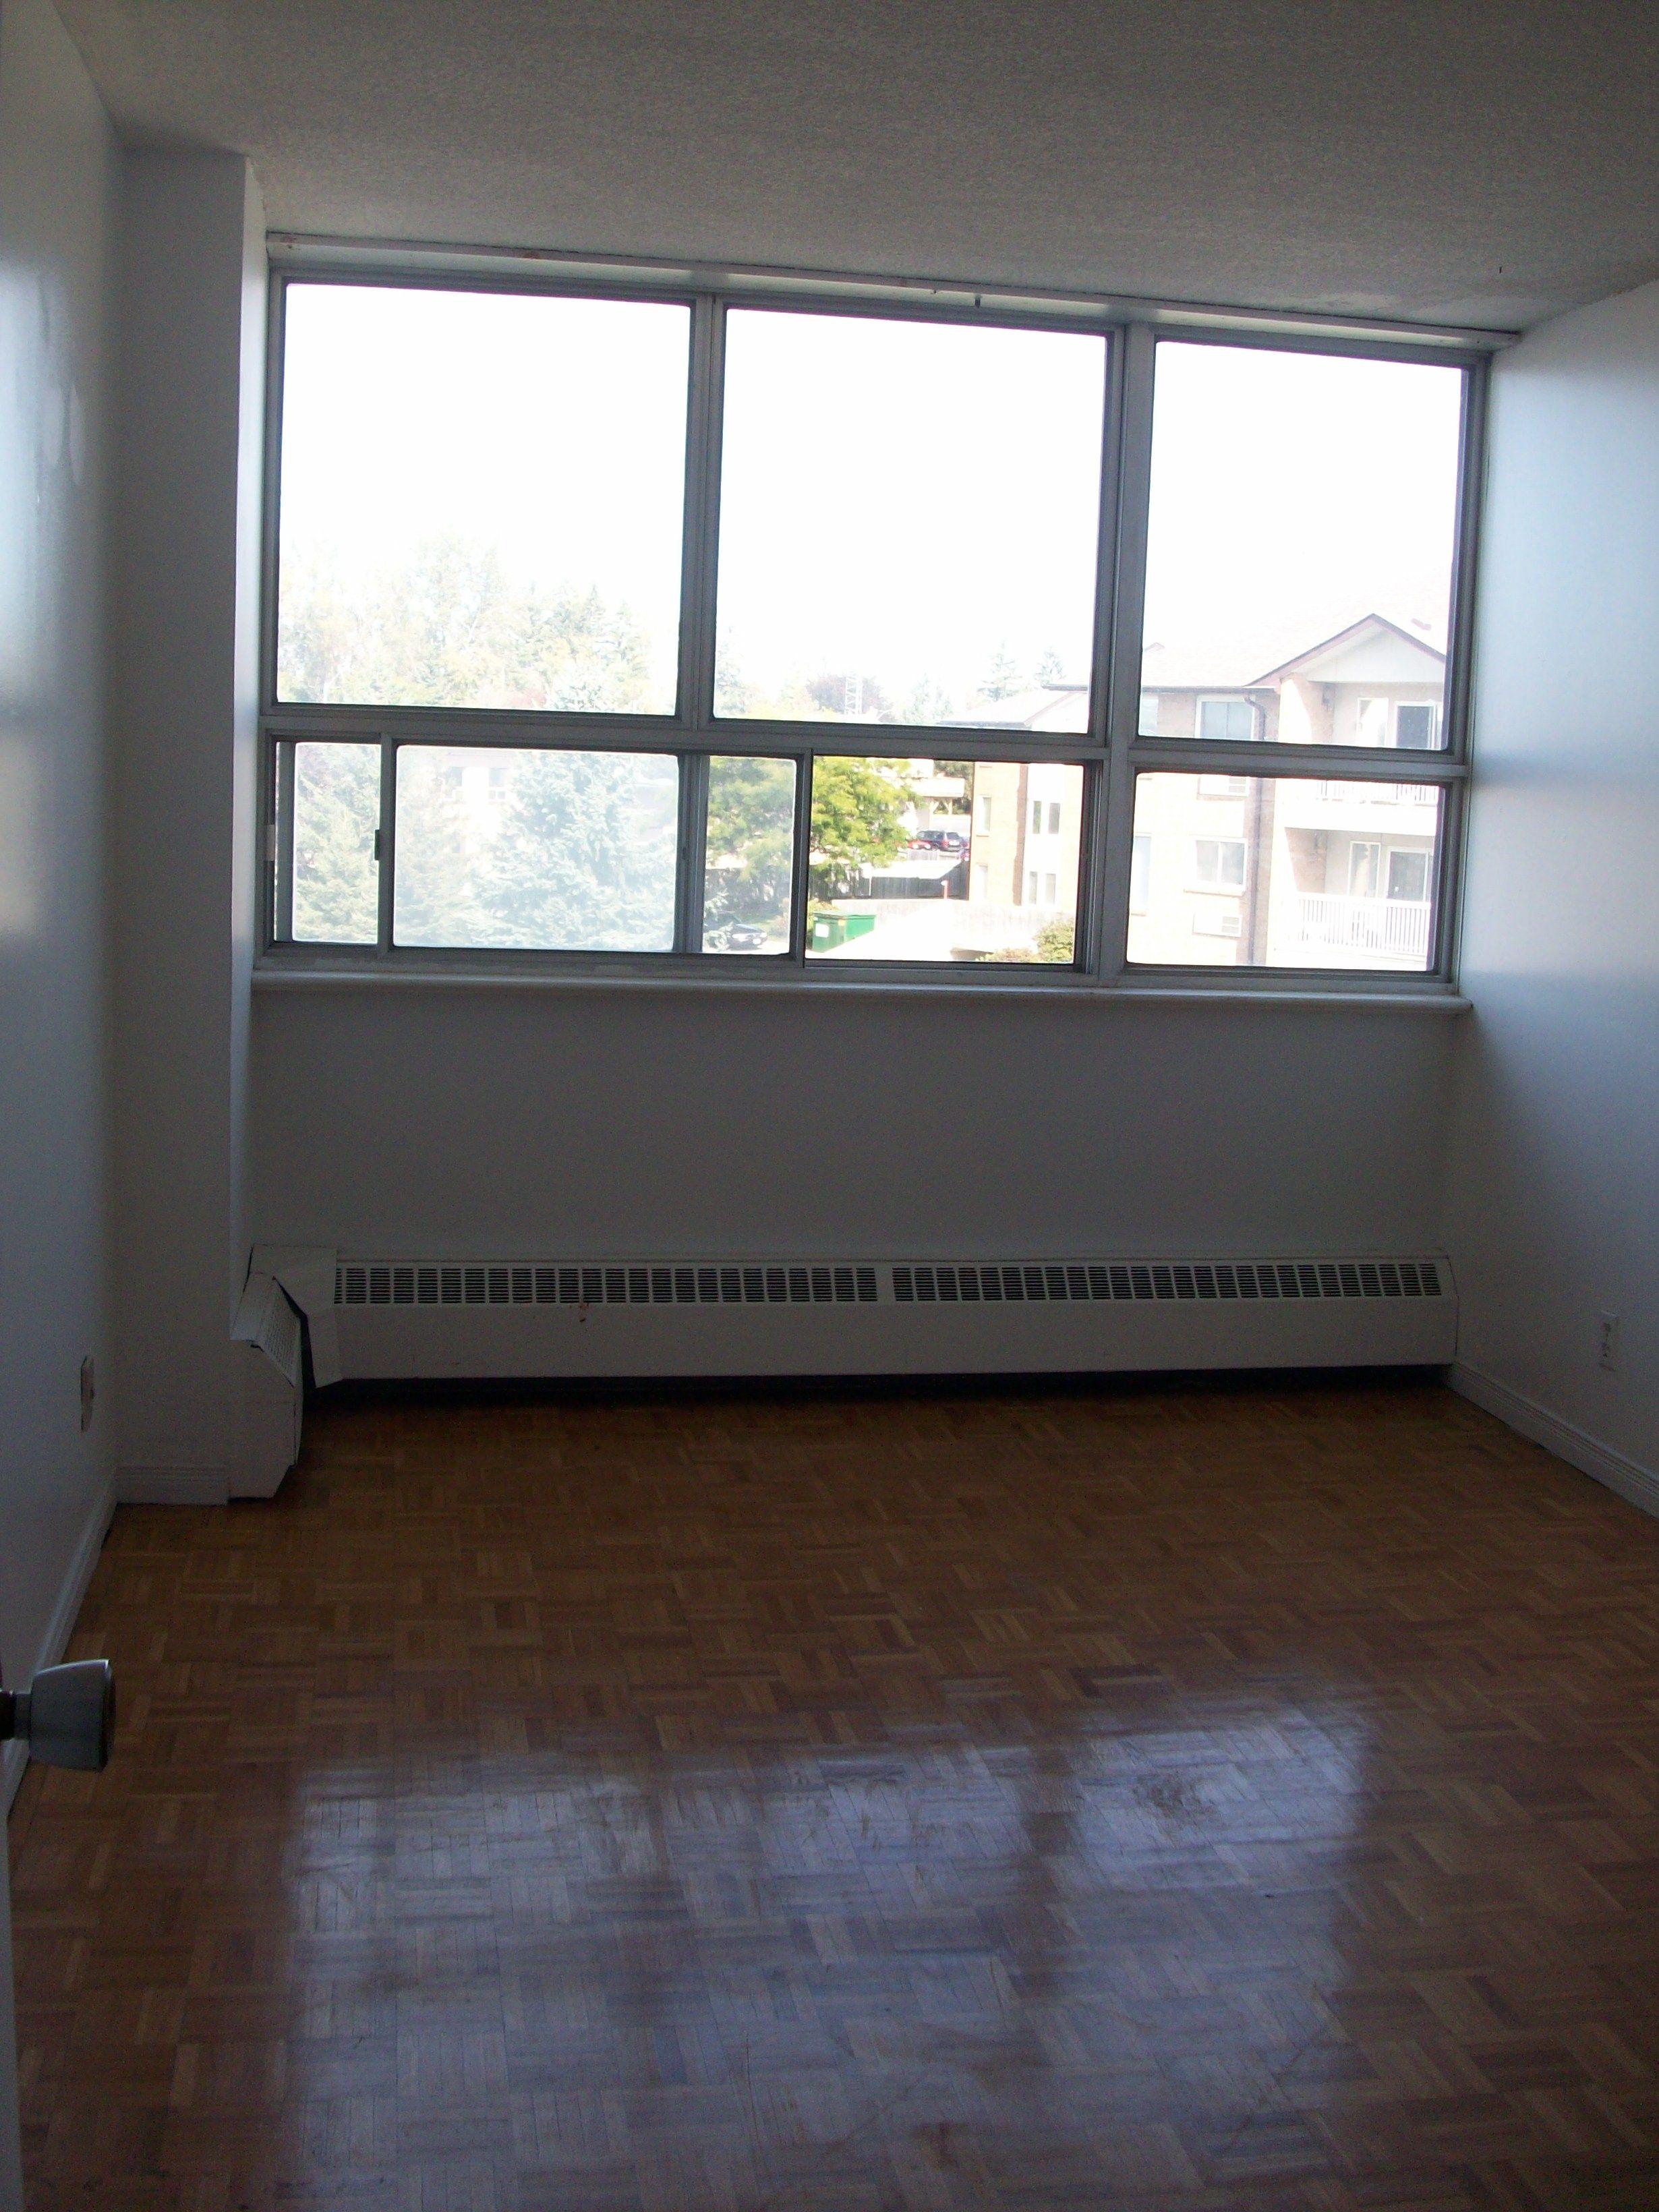 Kijiji Calgary Apartments For Rent 1 Bedroom | Ruivadelow